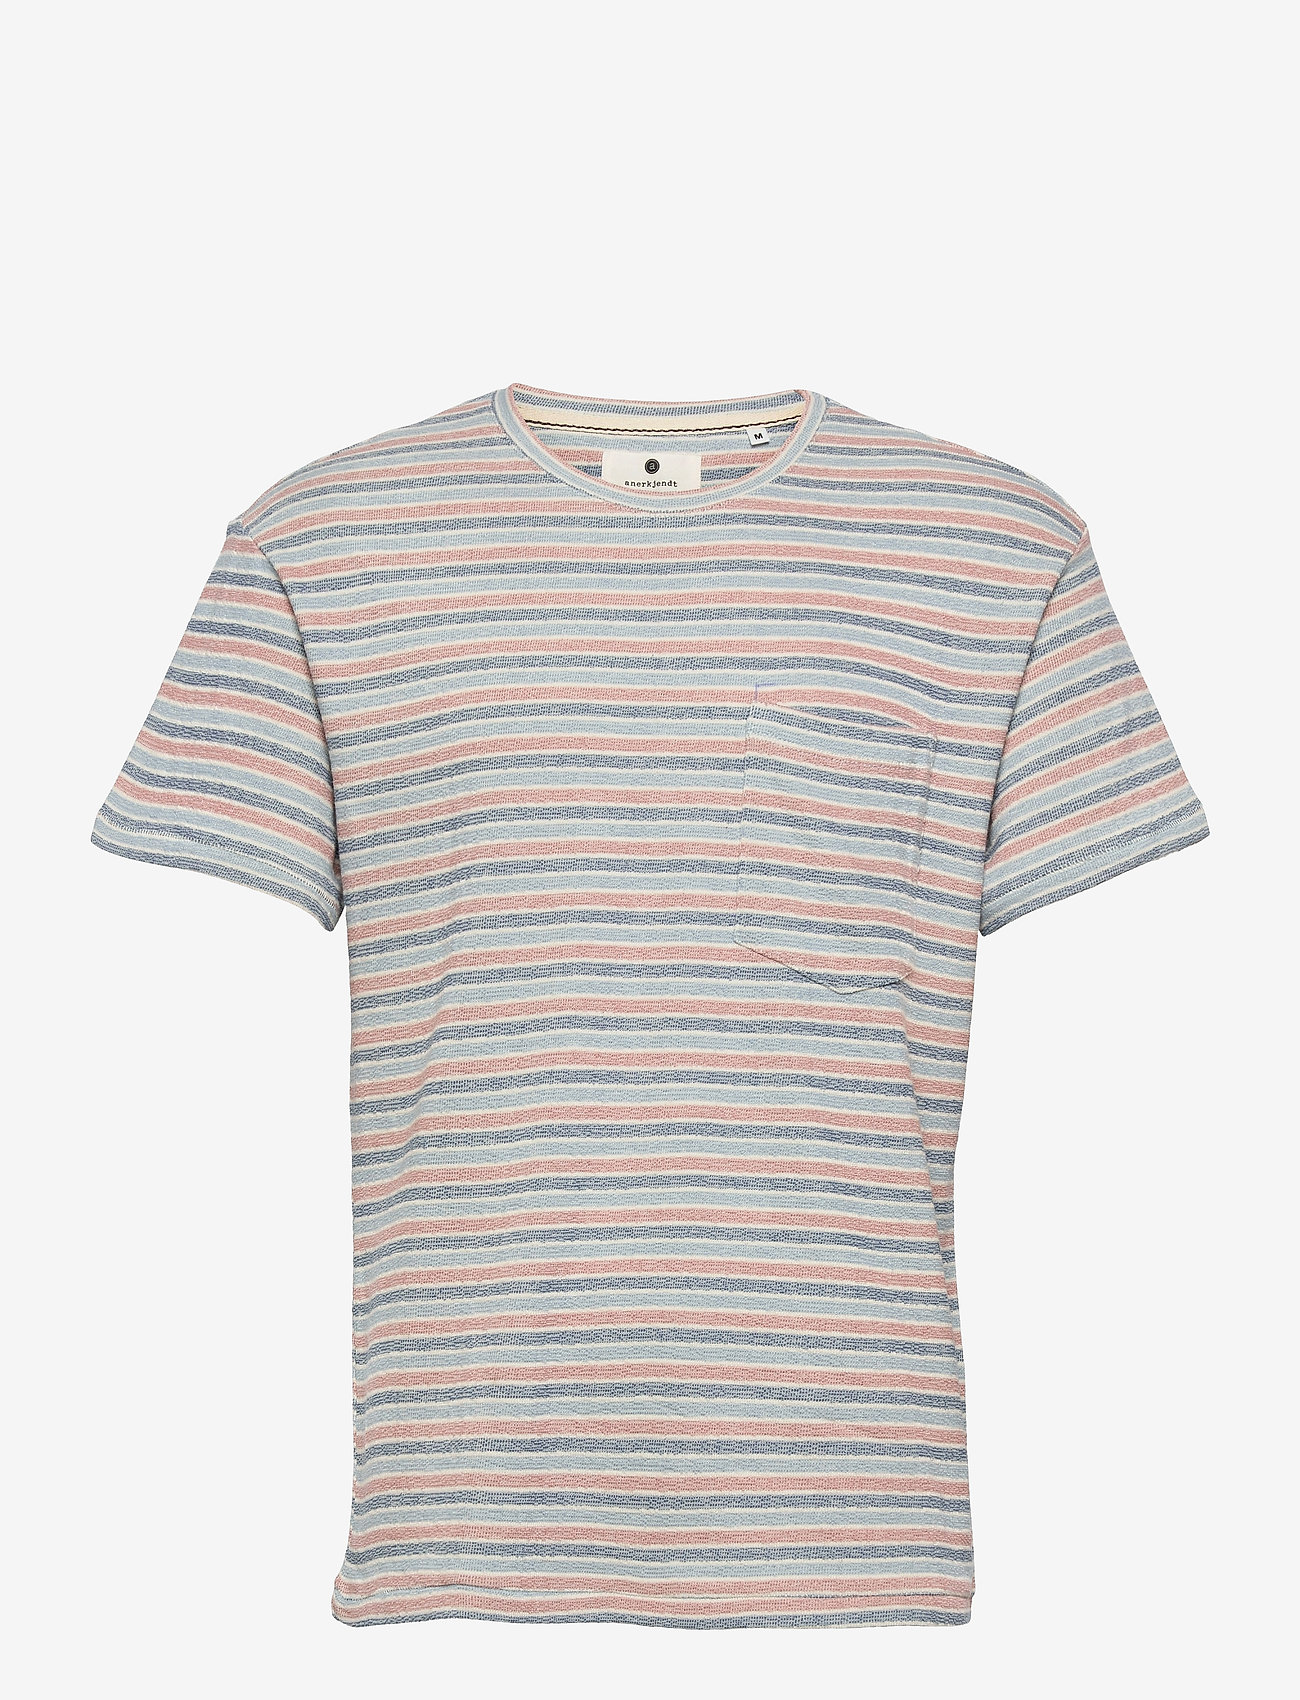 Anerkjendt - AKKIKKI STRIPE - t-shirts à manches courtes - tofu - 0